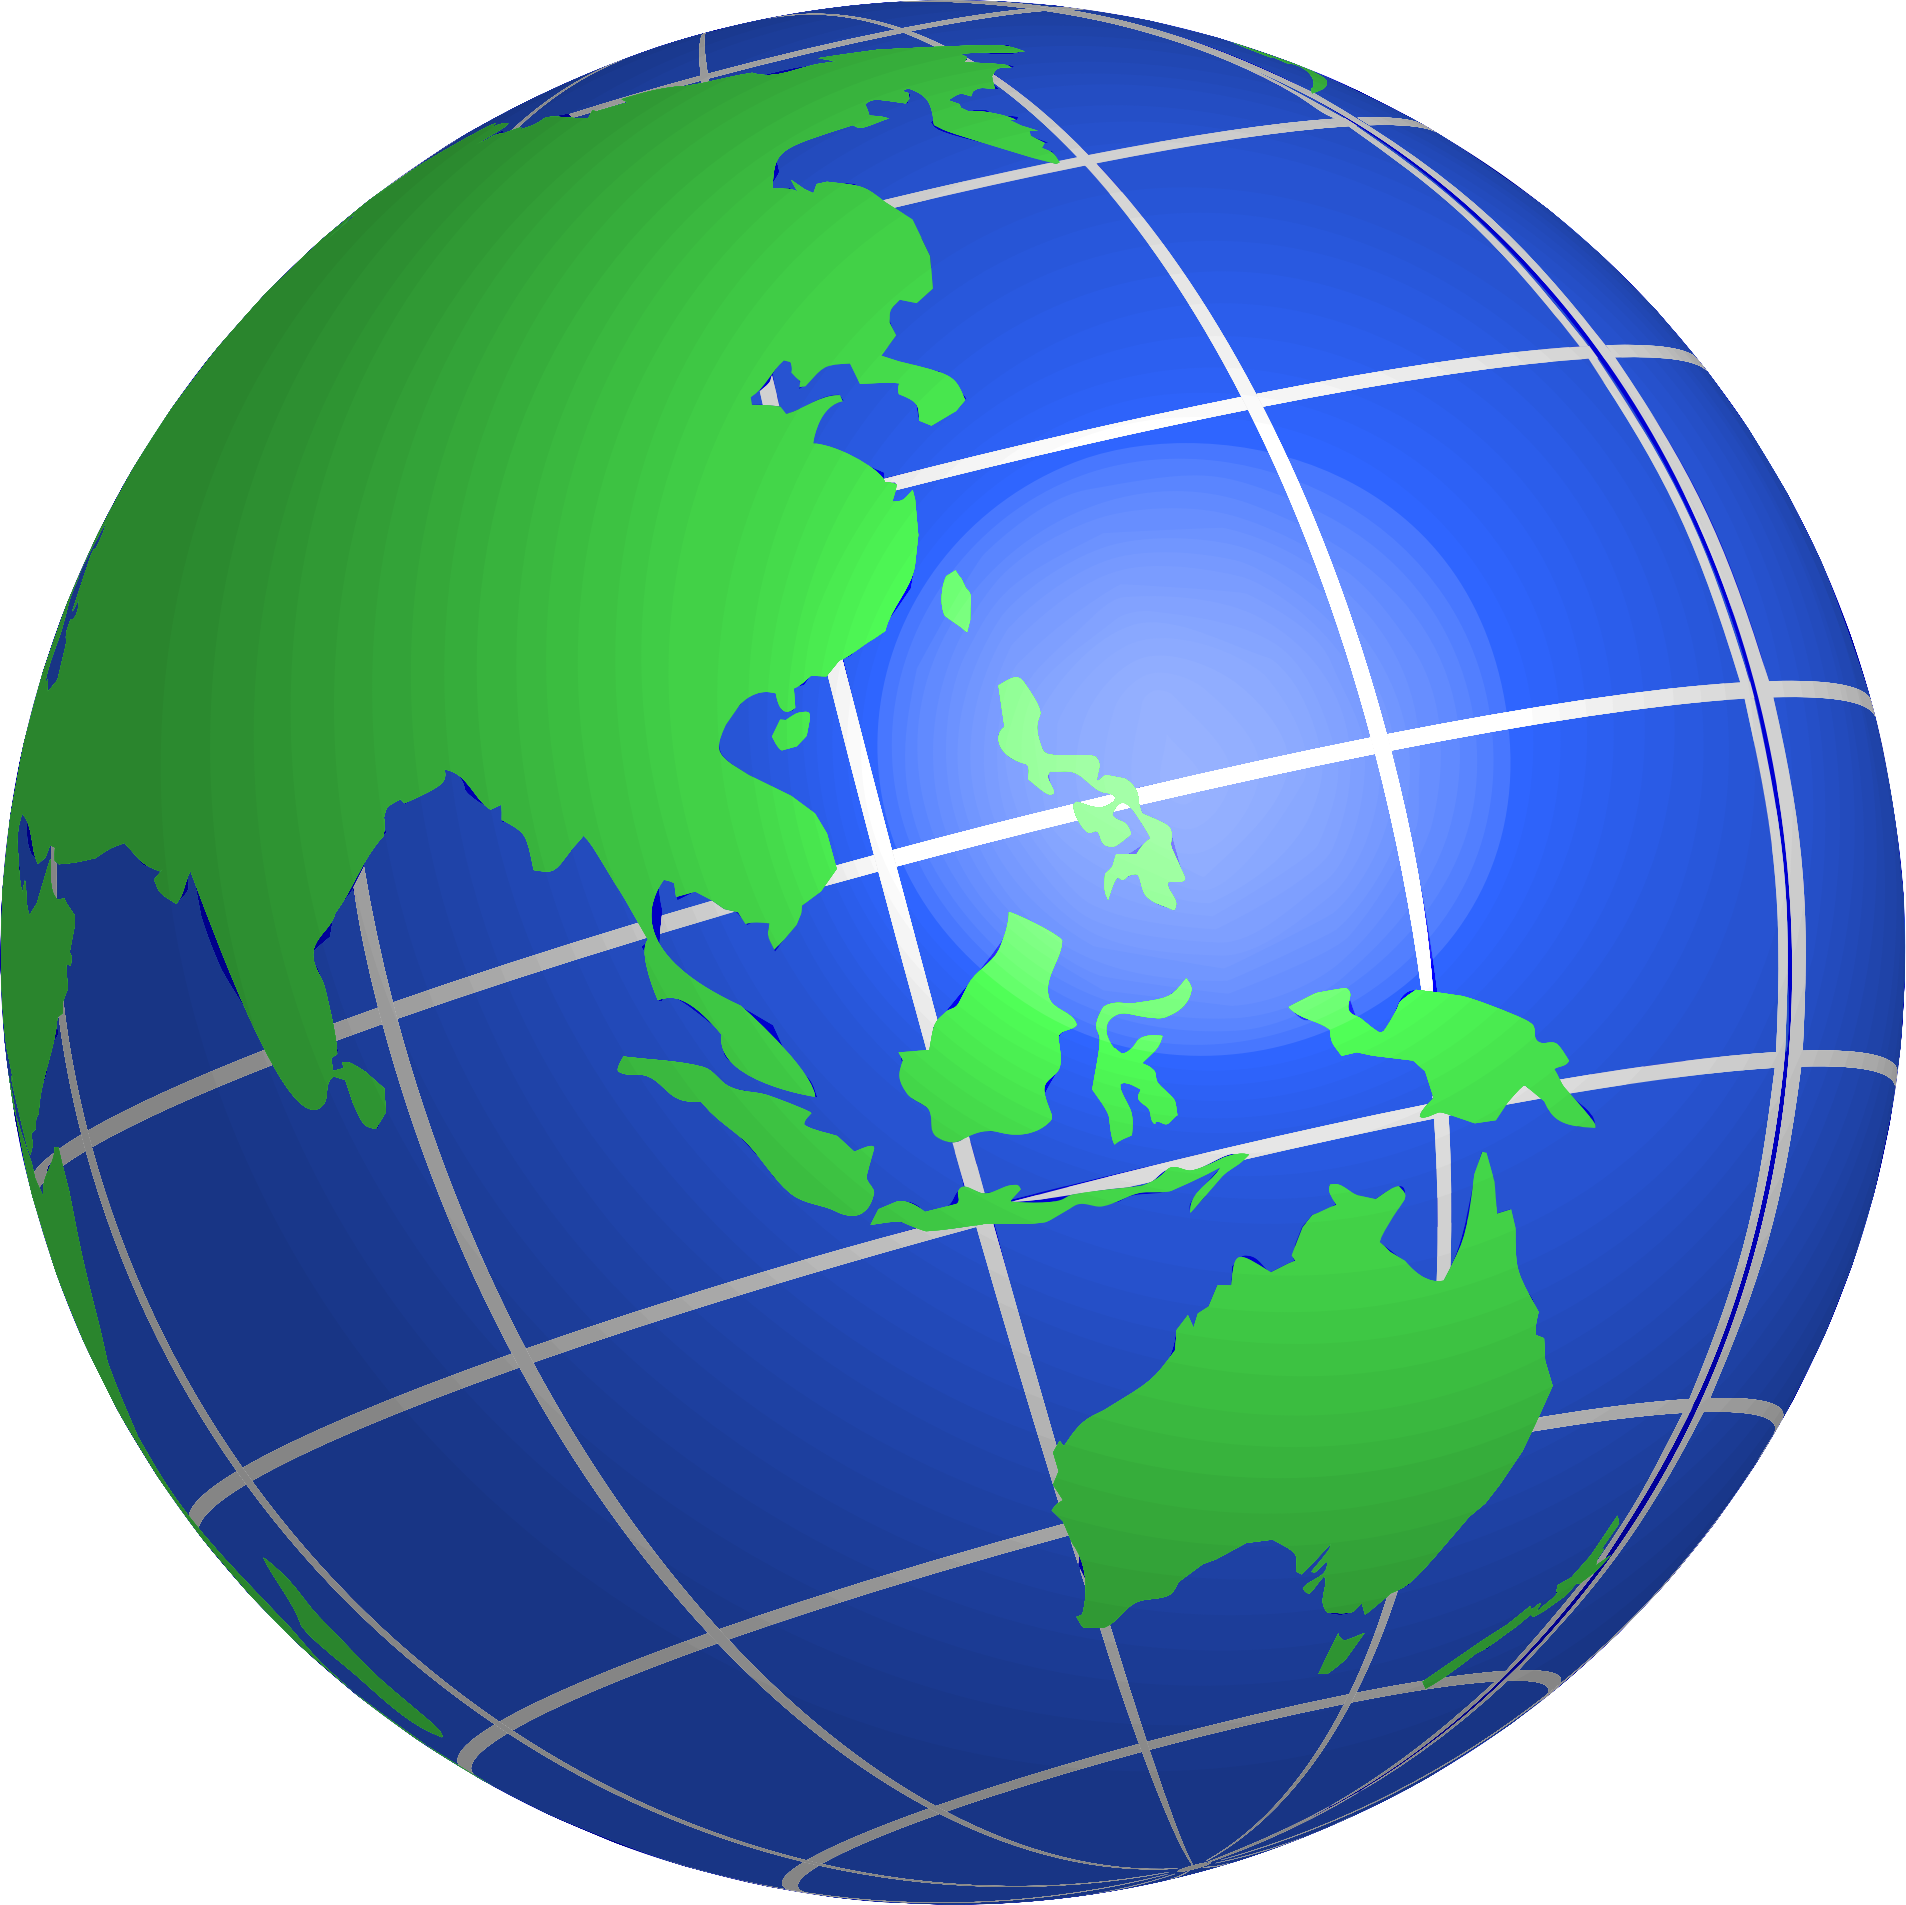 jpg library World clipart. Oceania globe big image